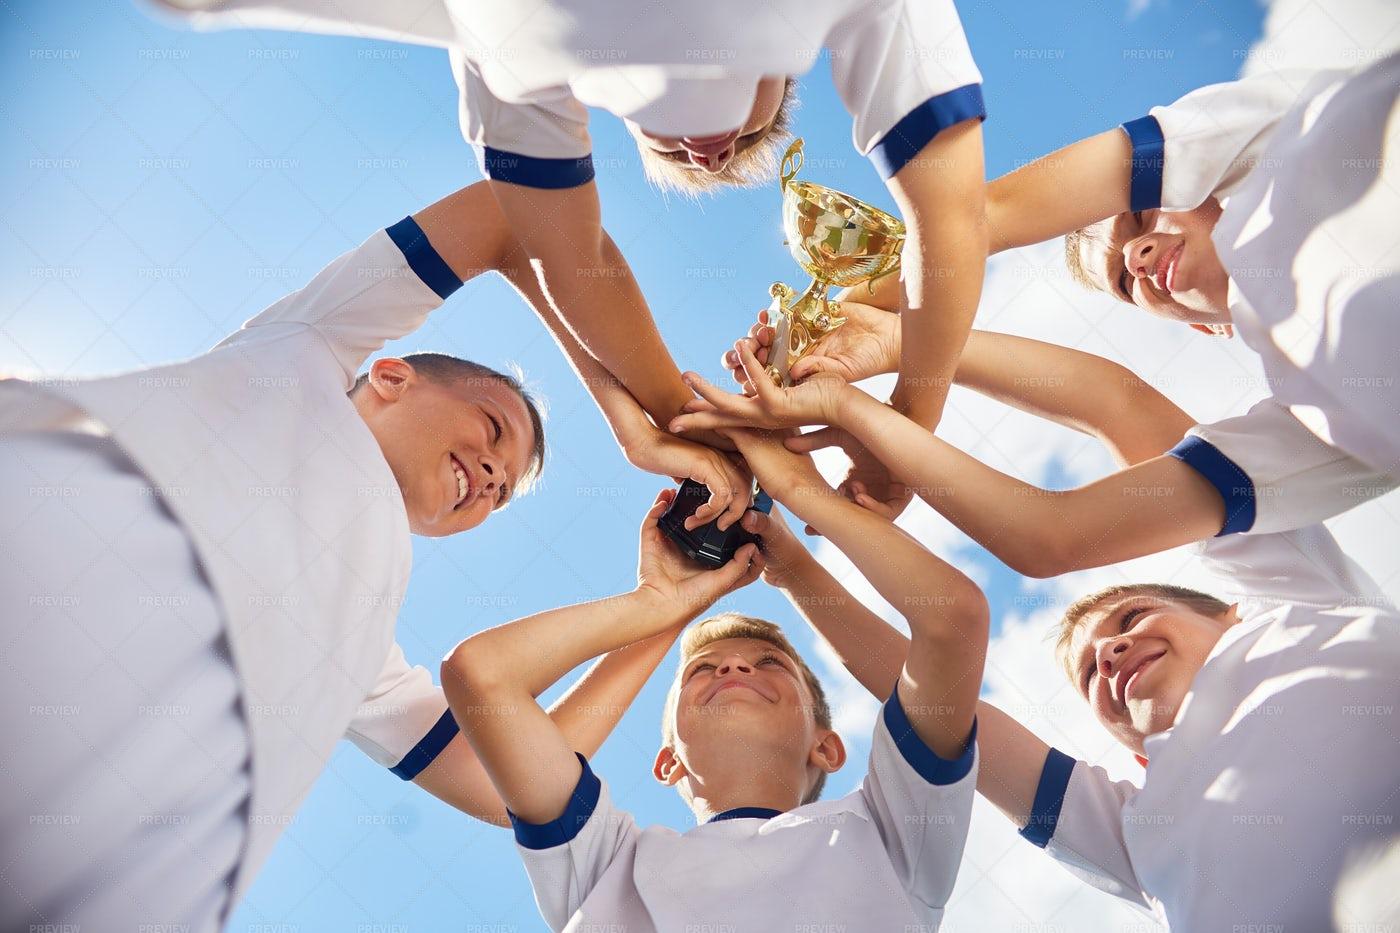 Boys Winning Football Match: Stock Photos